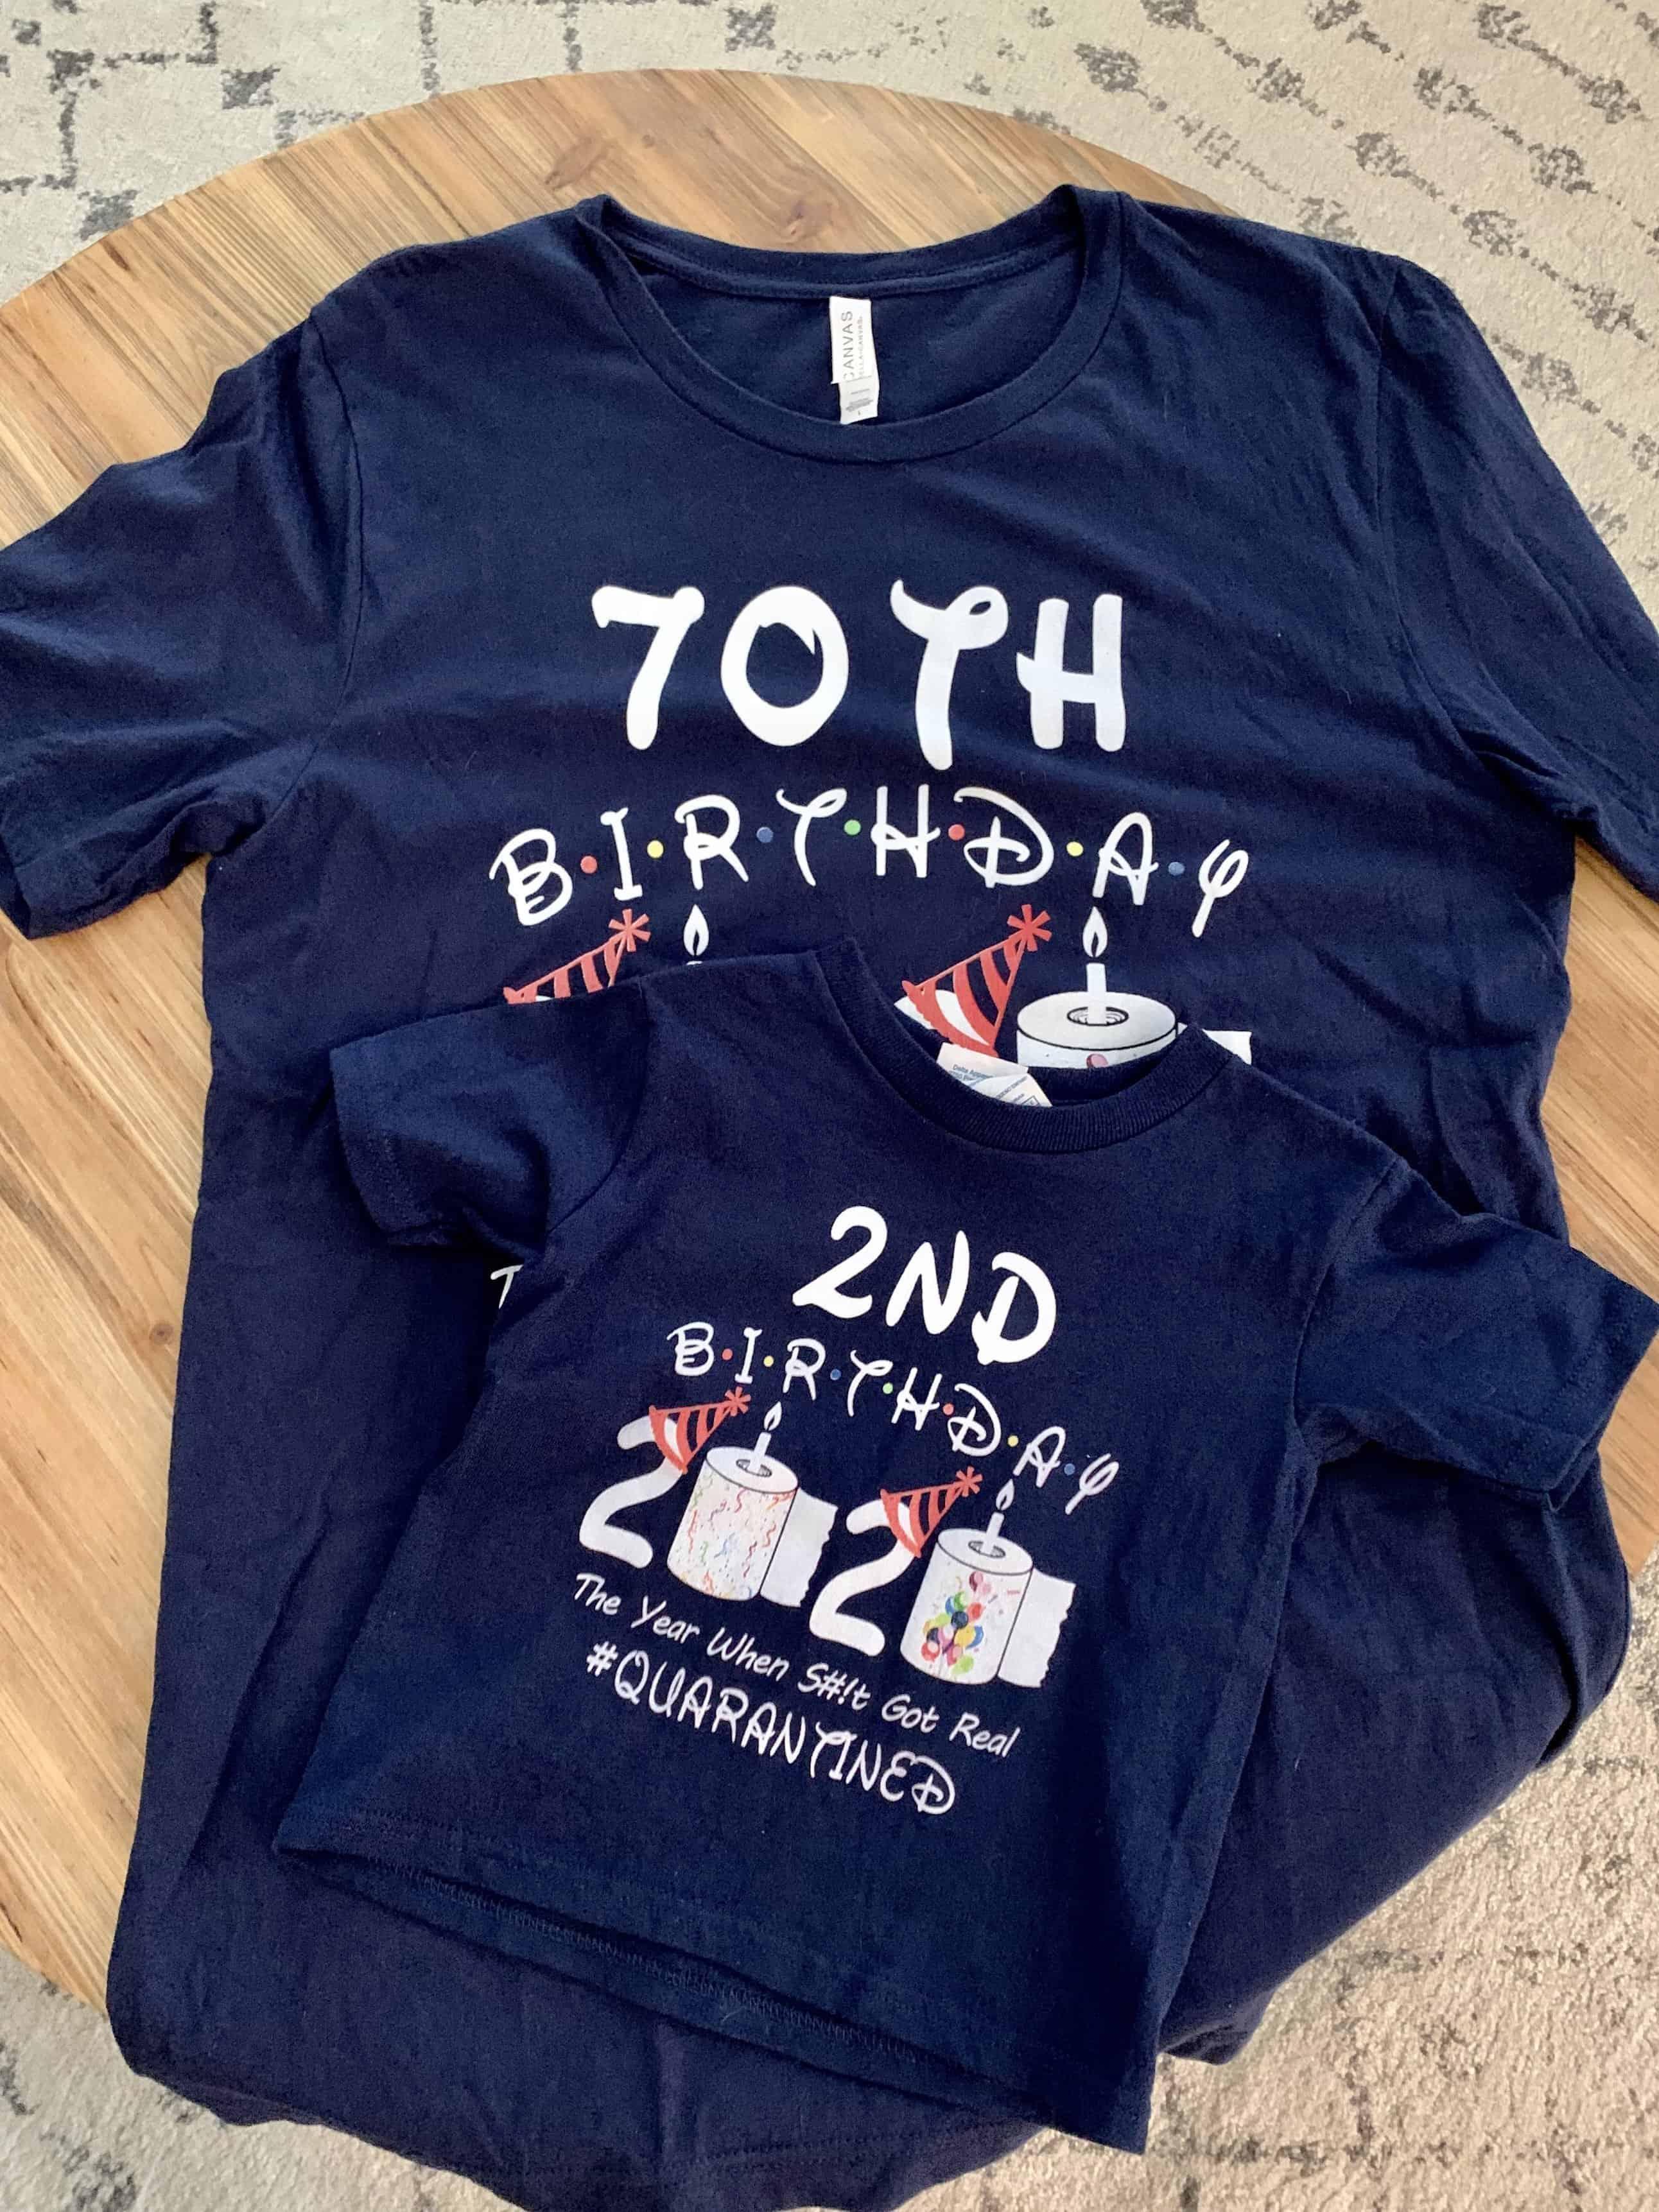 Quarantine birthday t-shirts